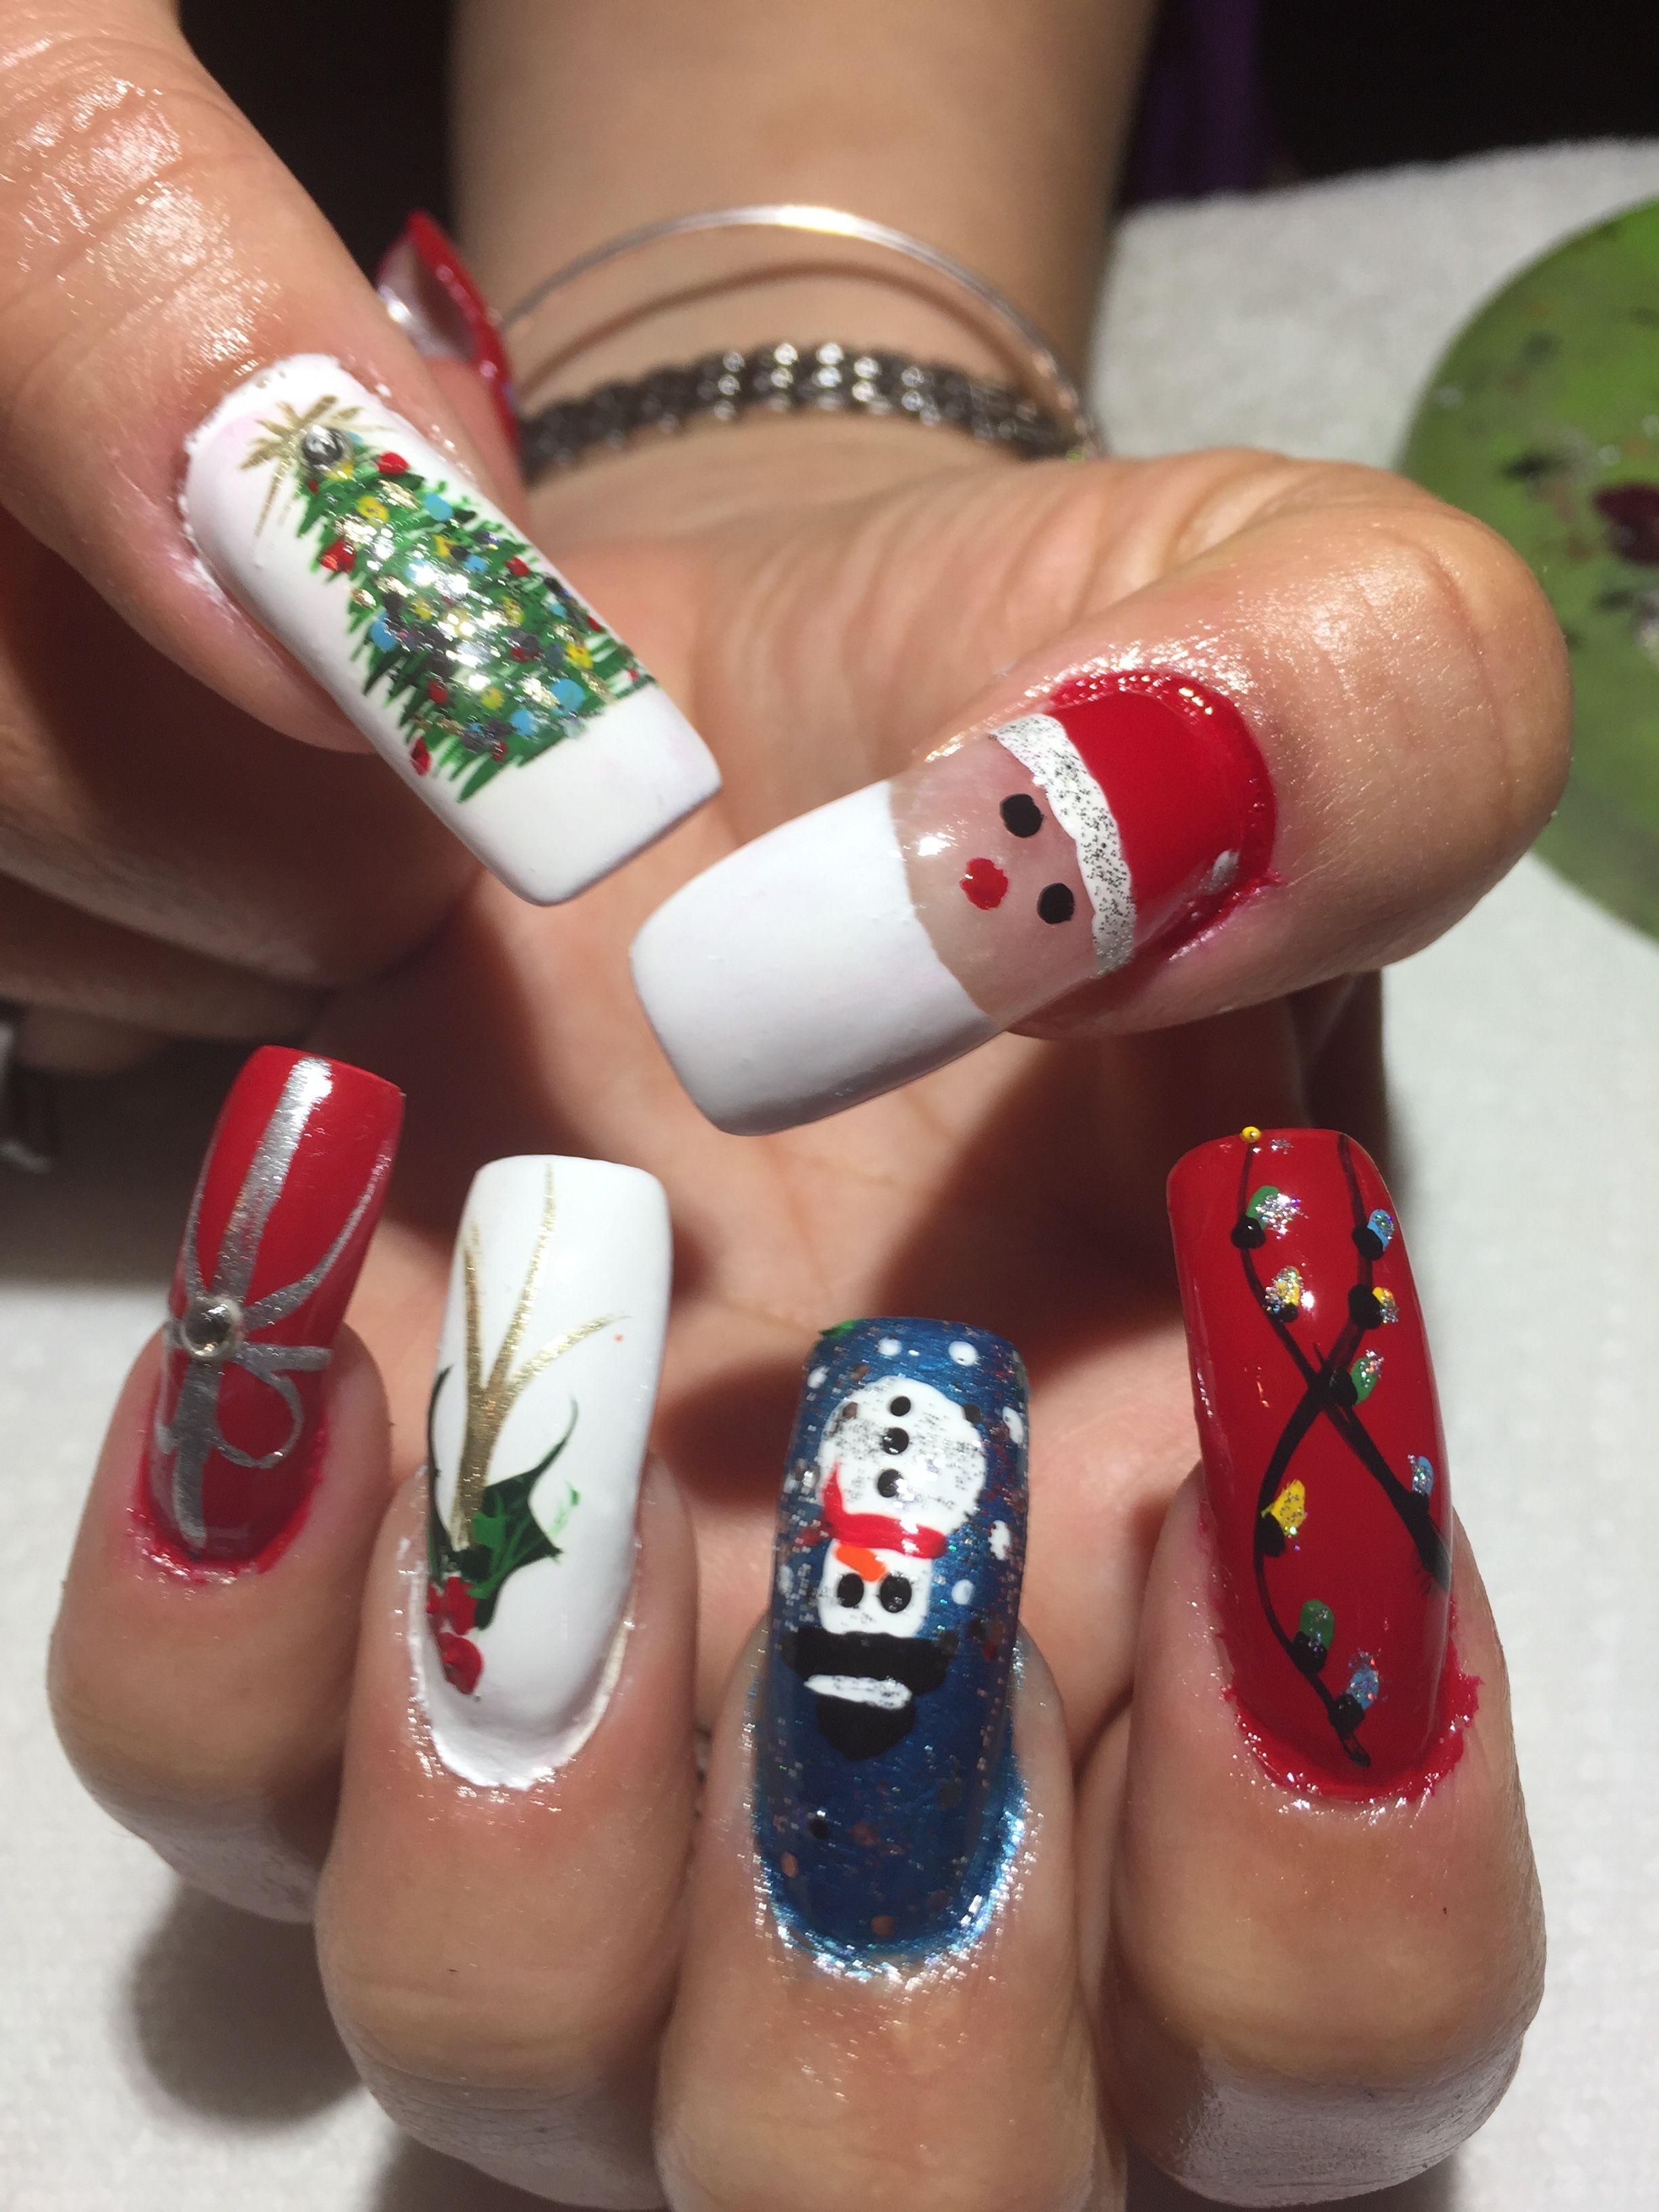 Pin by grace montelongo on nail art pinterest